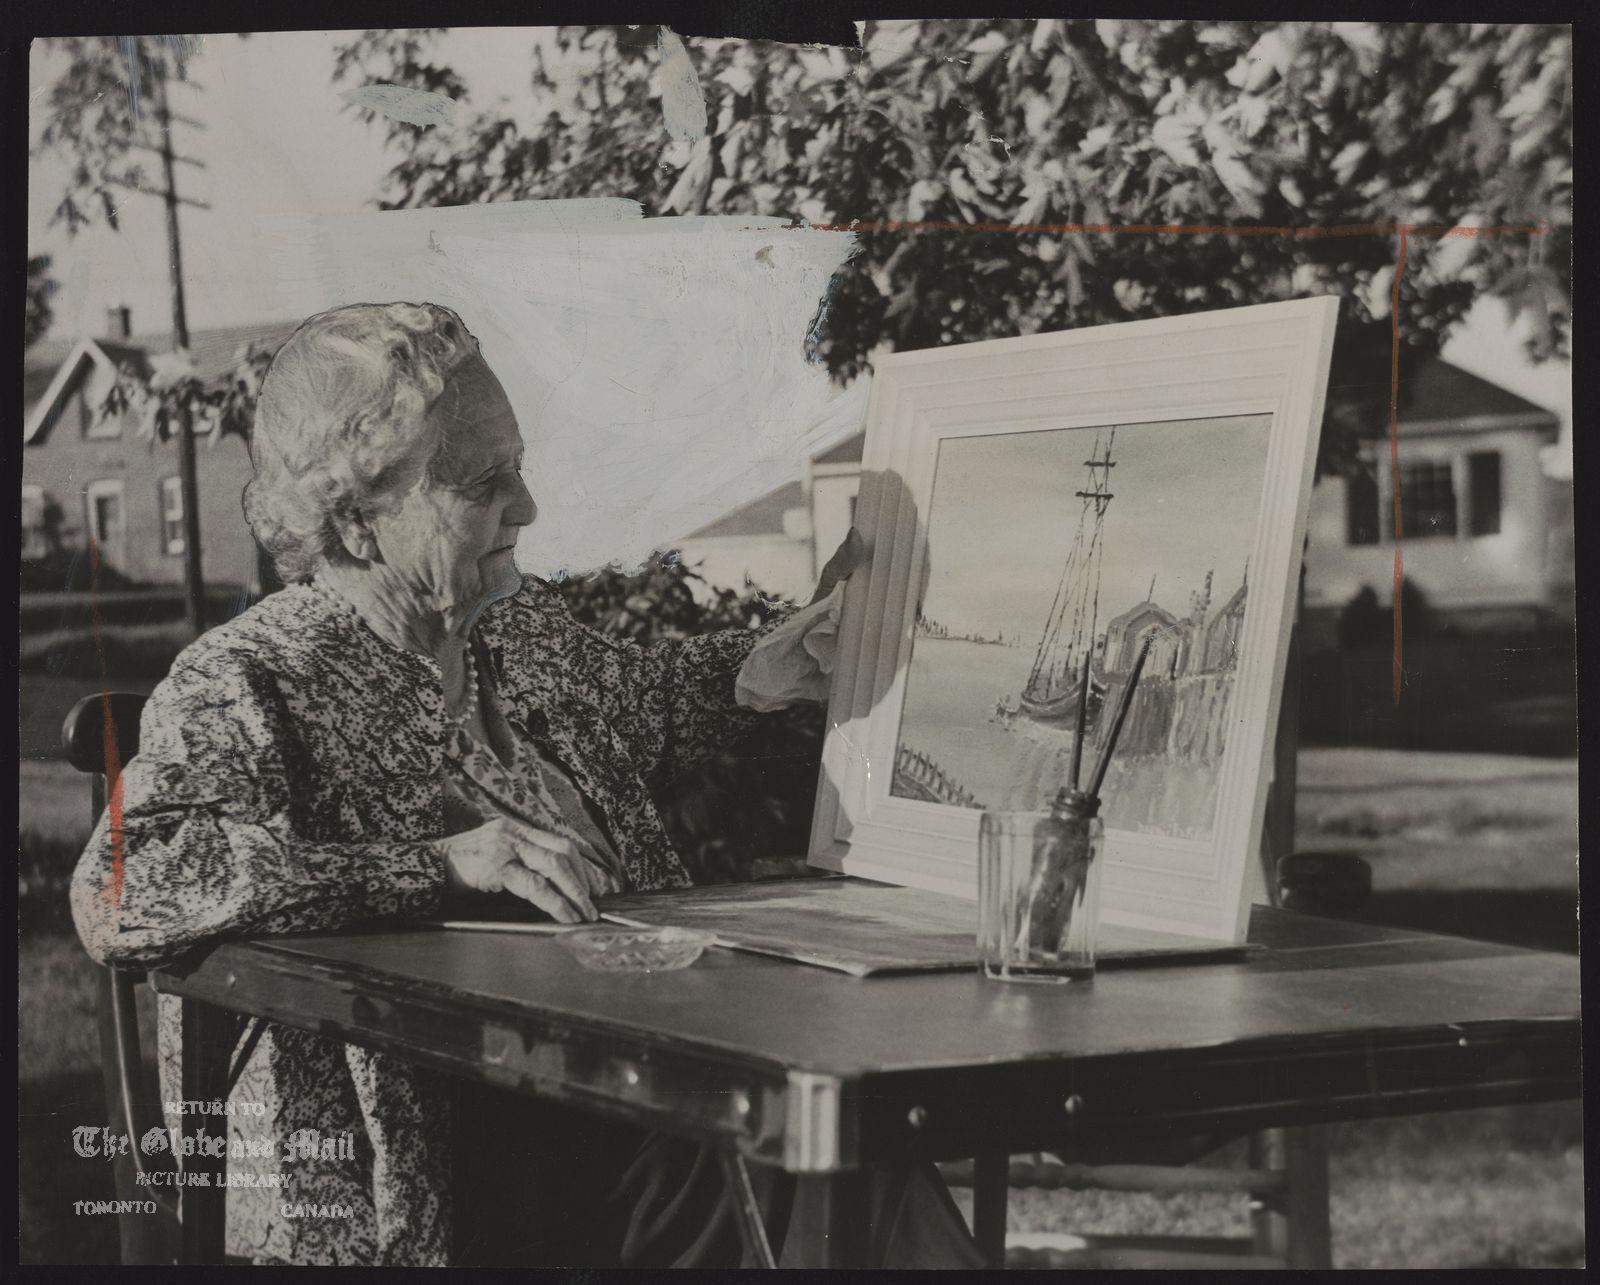 In her Burks Falls garden, Grandma Parker studies seacoast scene she painted [Mrs. Naomi Ada Parker, artist]